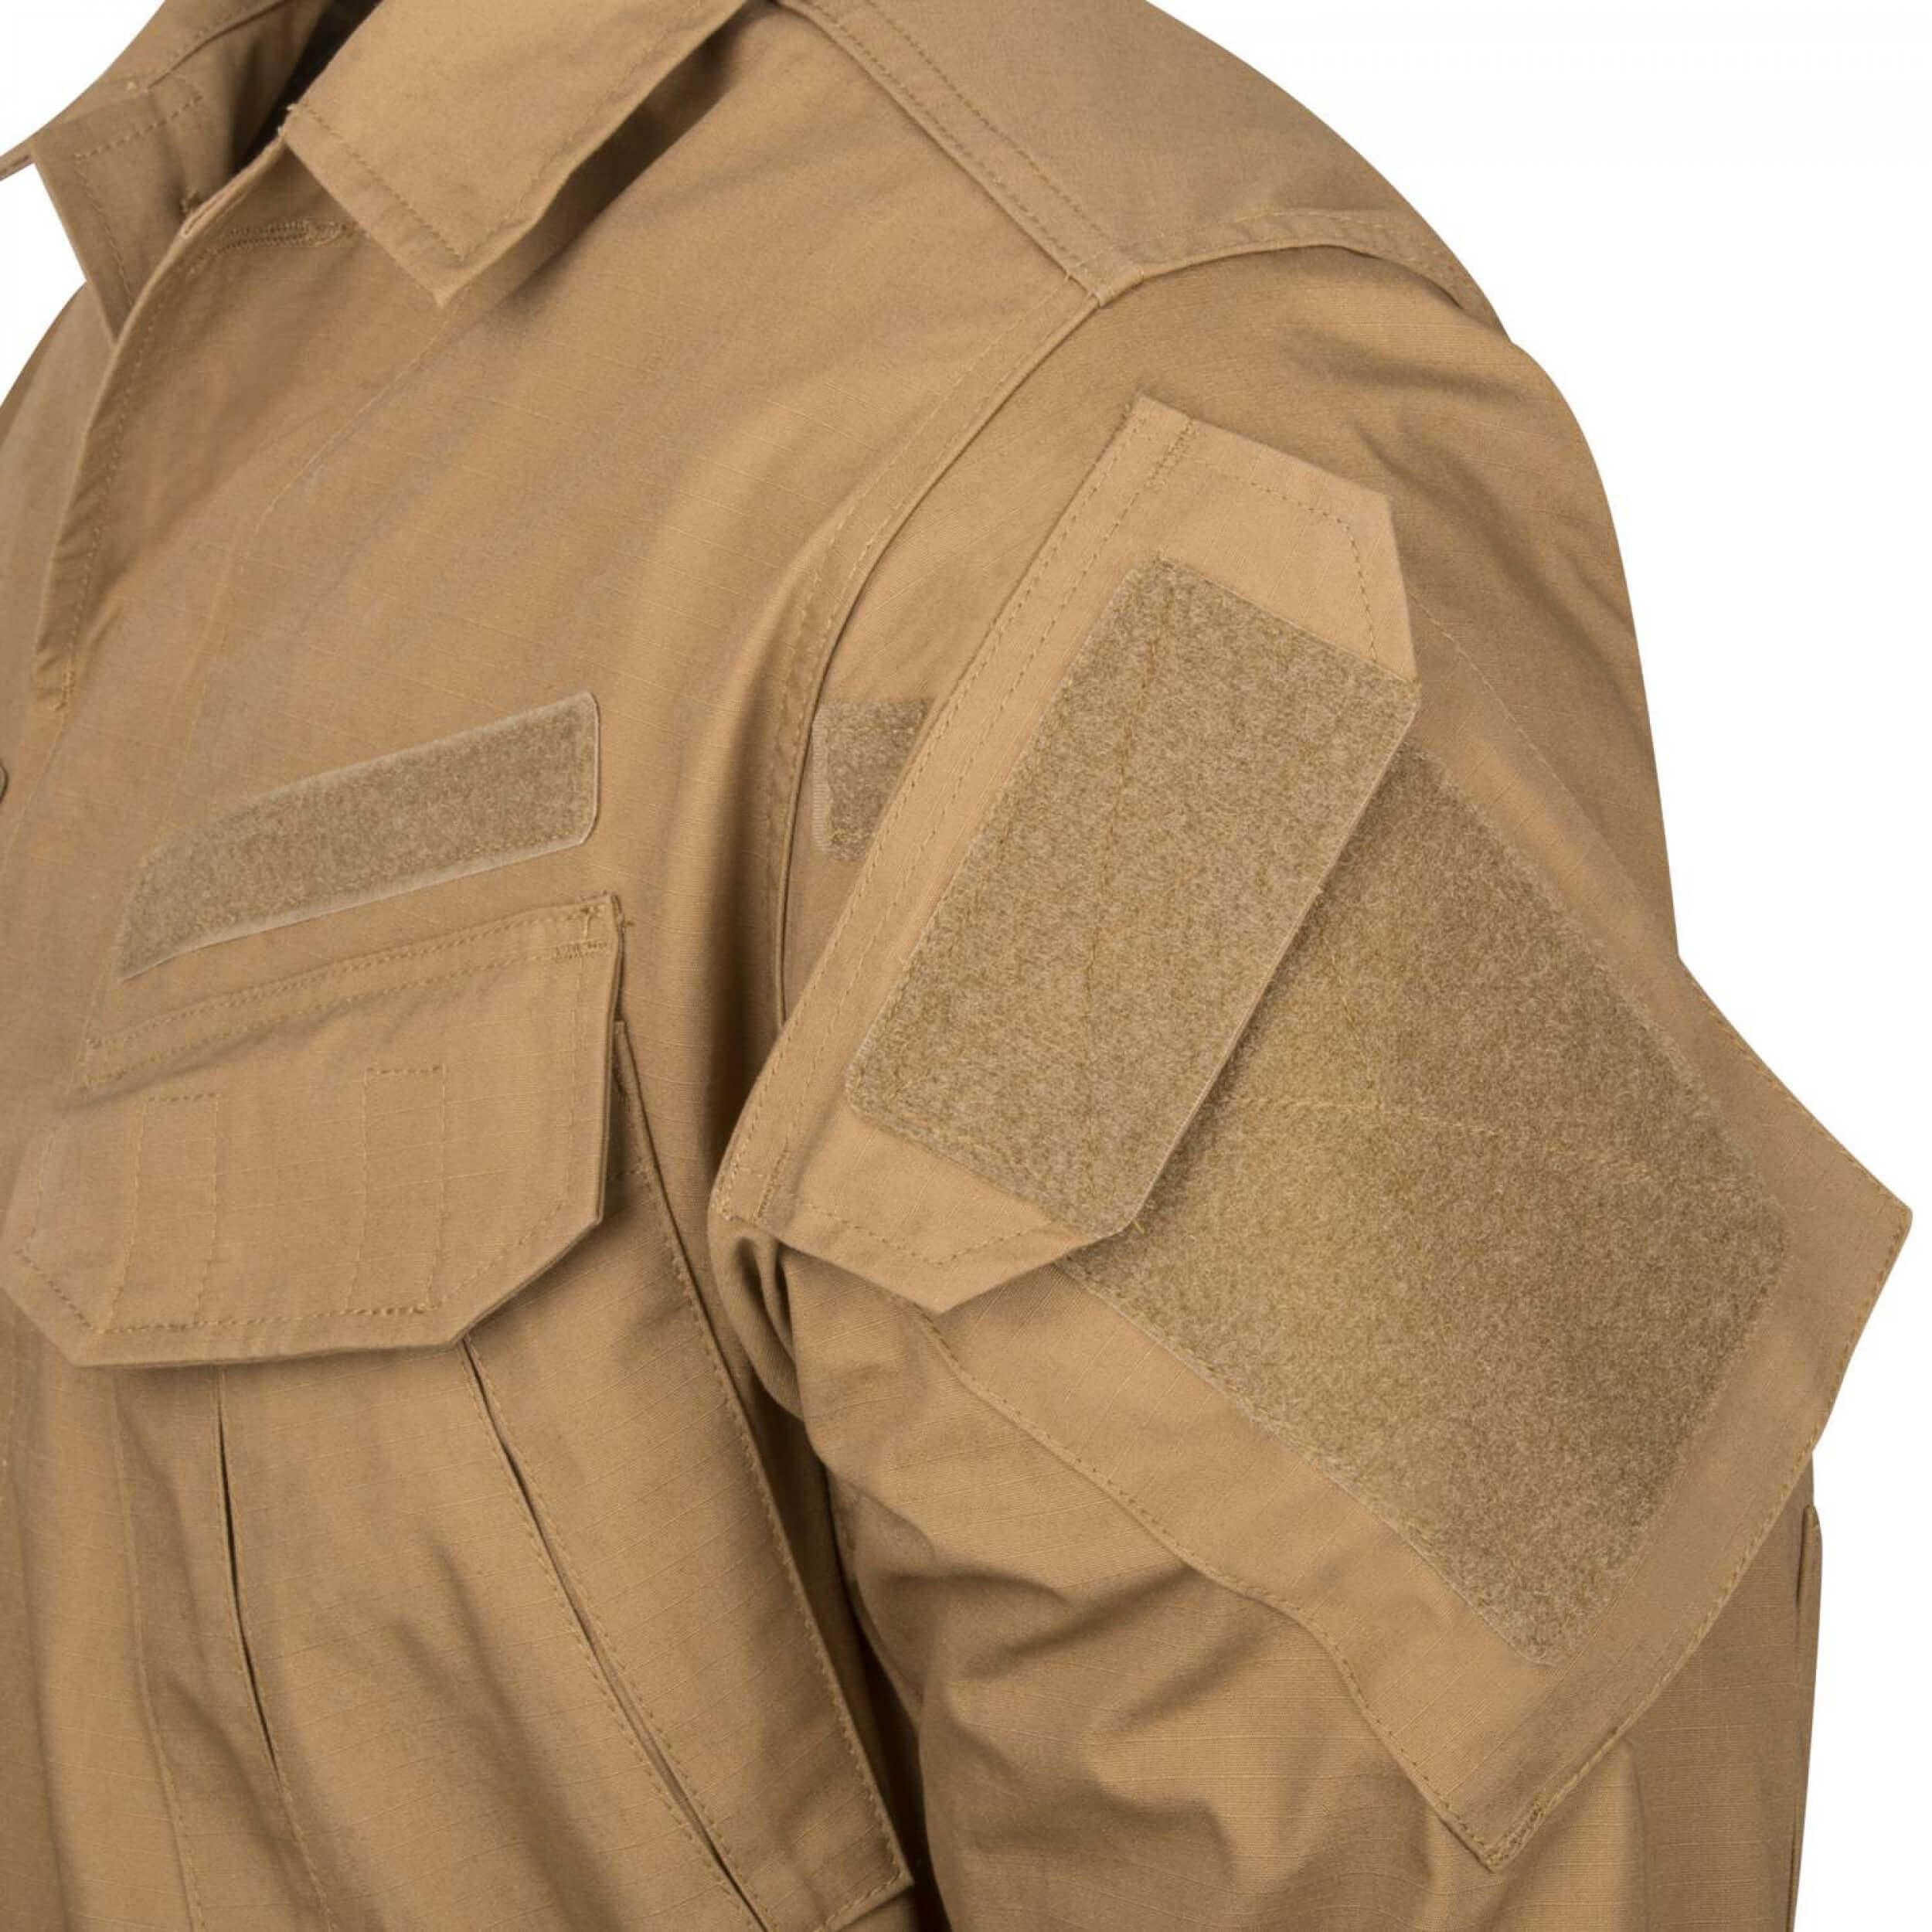 Helikon-Tex SFU Next Shirt - PolyCotton Ripstop - Shadow Grey